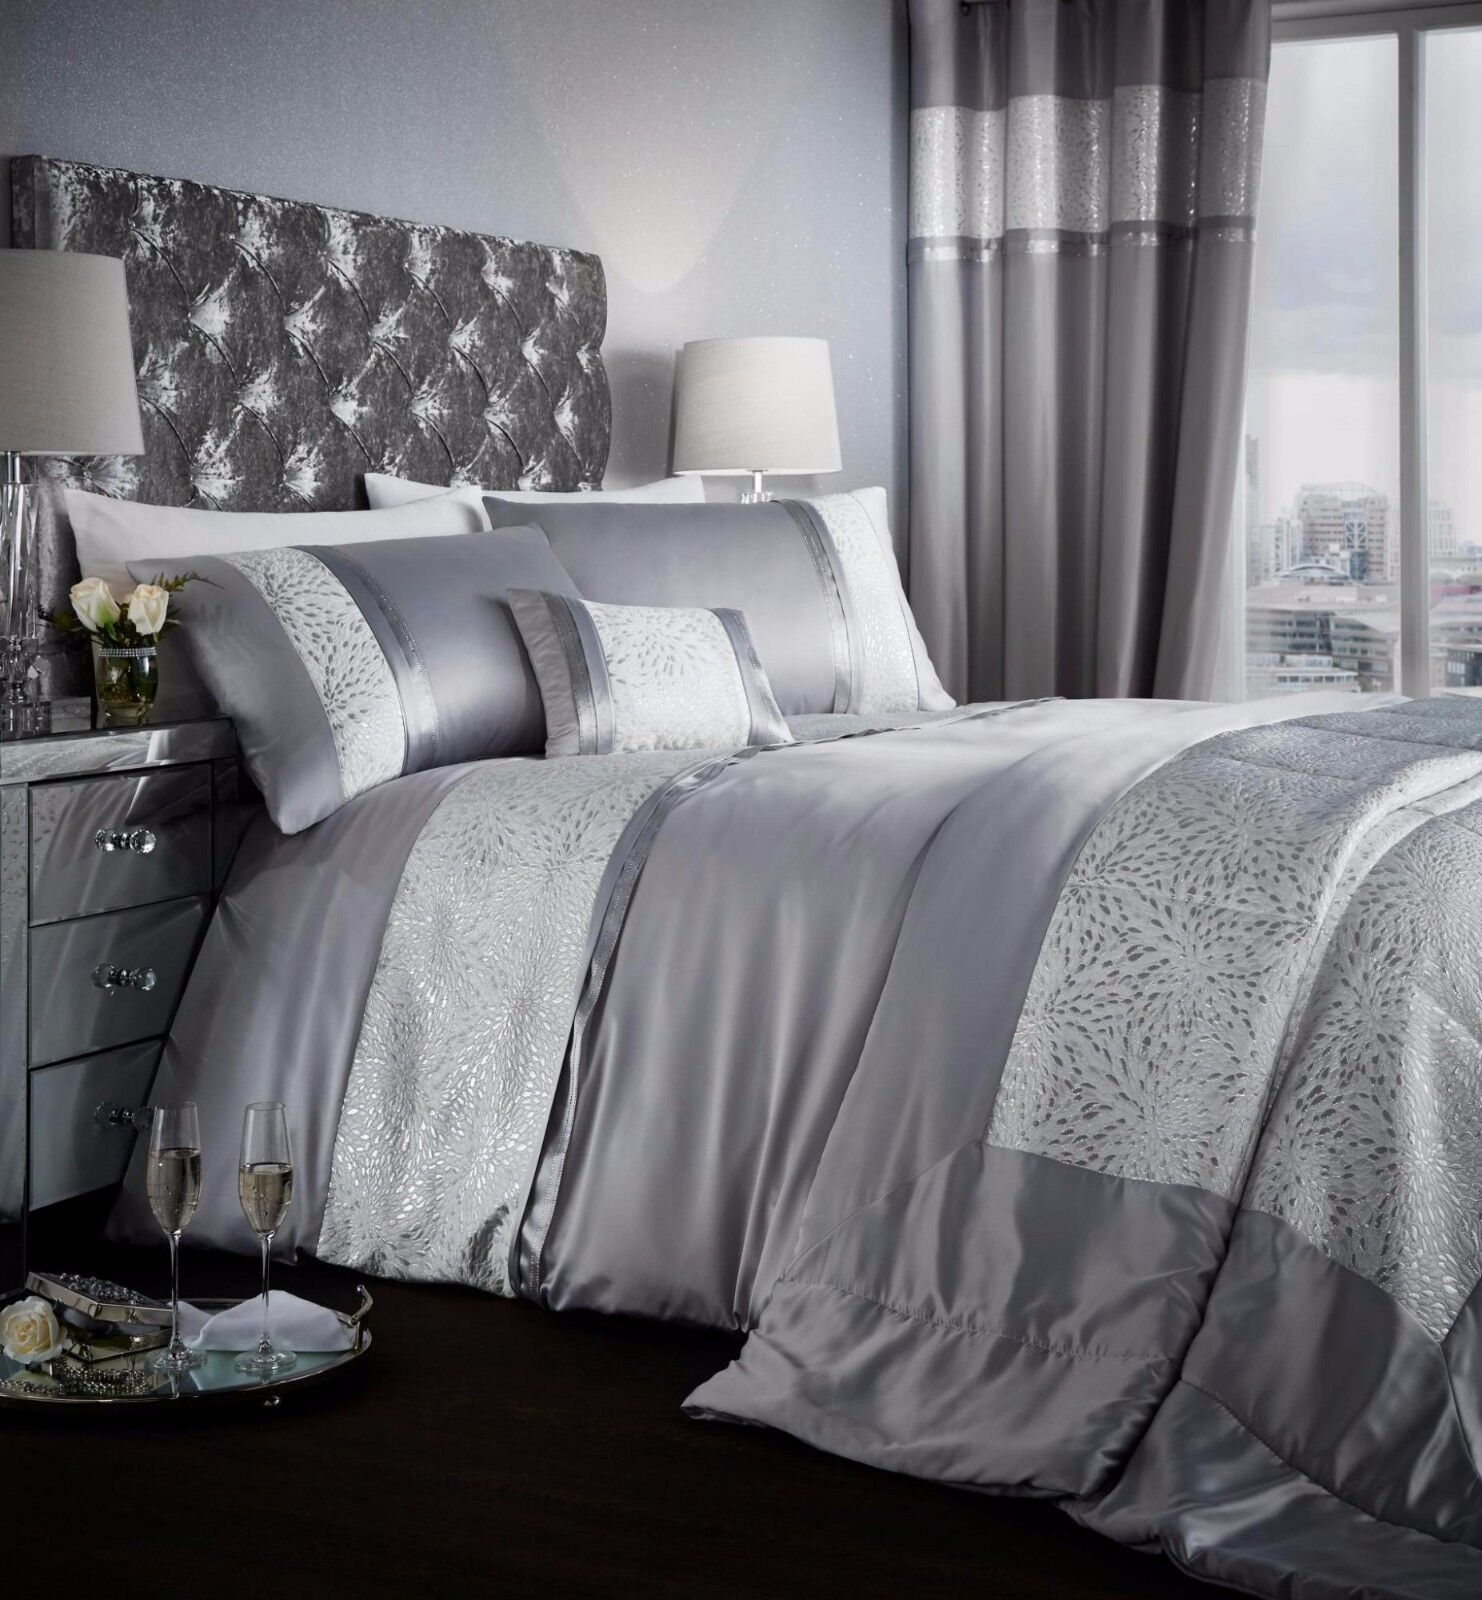 catherine lansfield luxor jacquard duvet cover bedding set. Black Bedroom Furniture Sets. Home Design Ideas